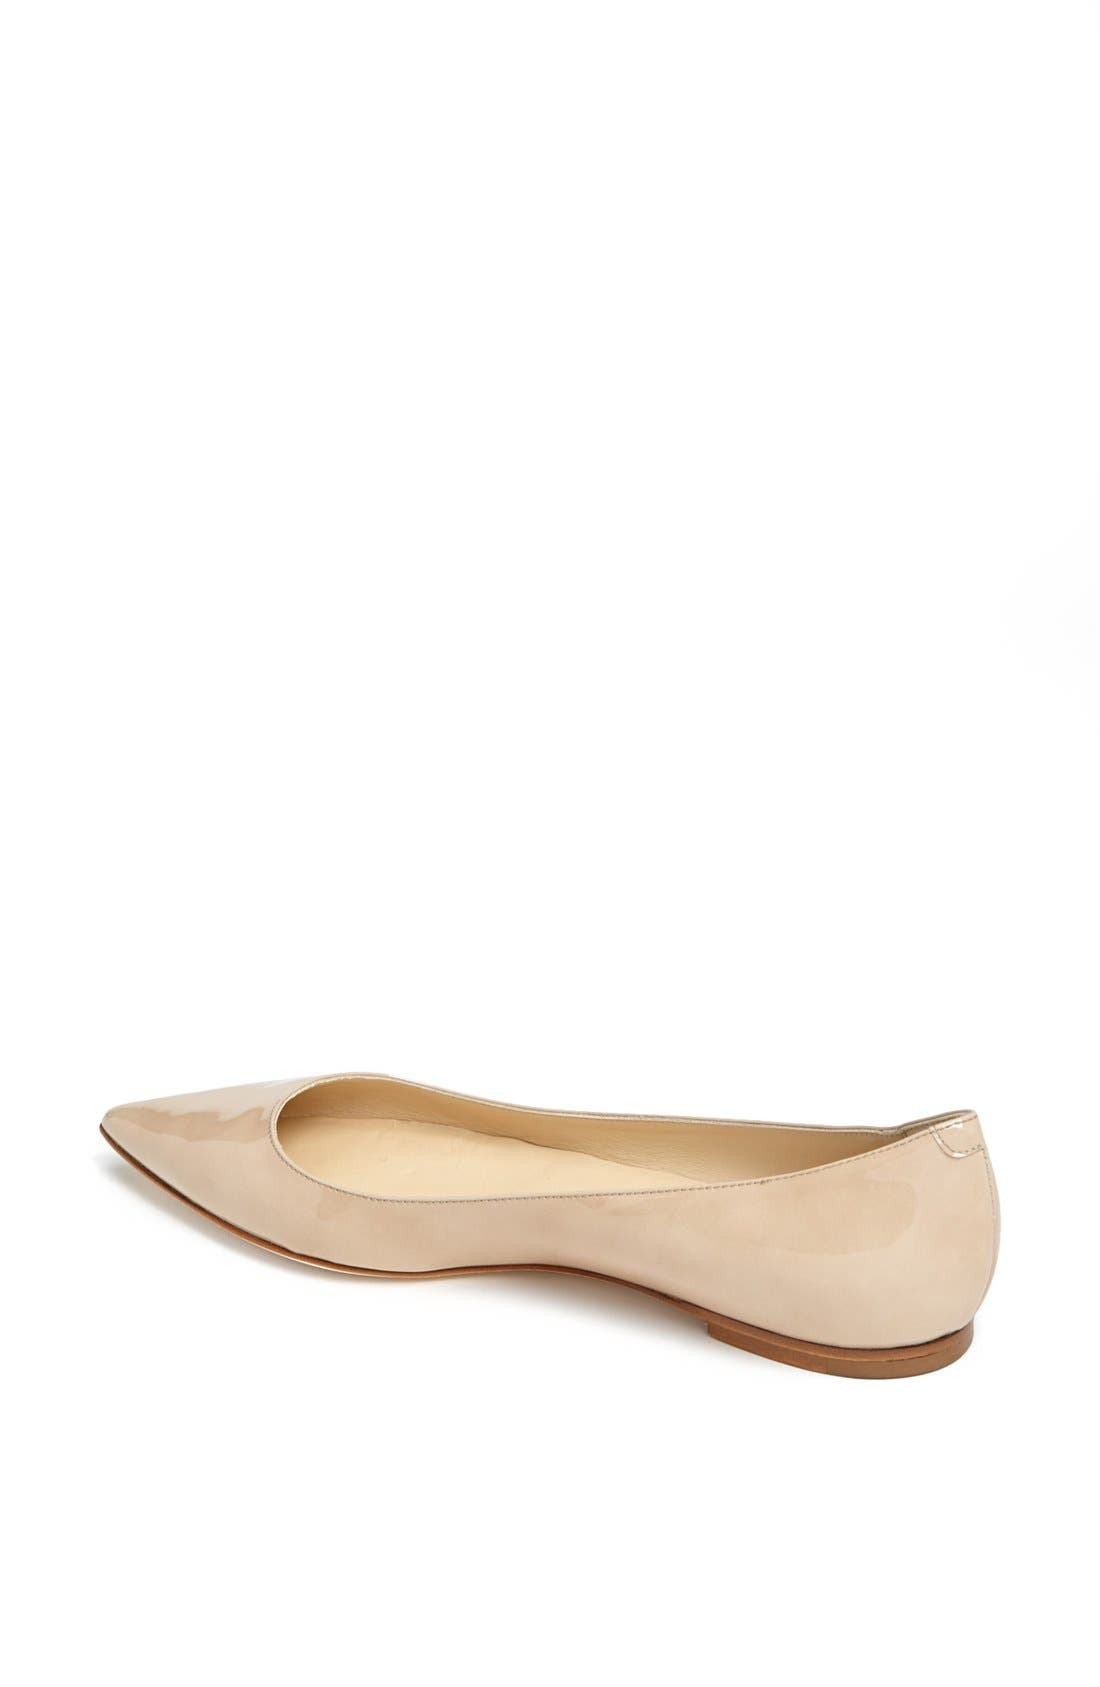 Alternate Image 2  - Jimmy Choo 'Alina' Pointy Toe Flat (Women)